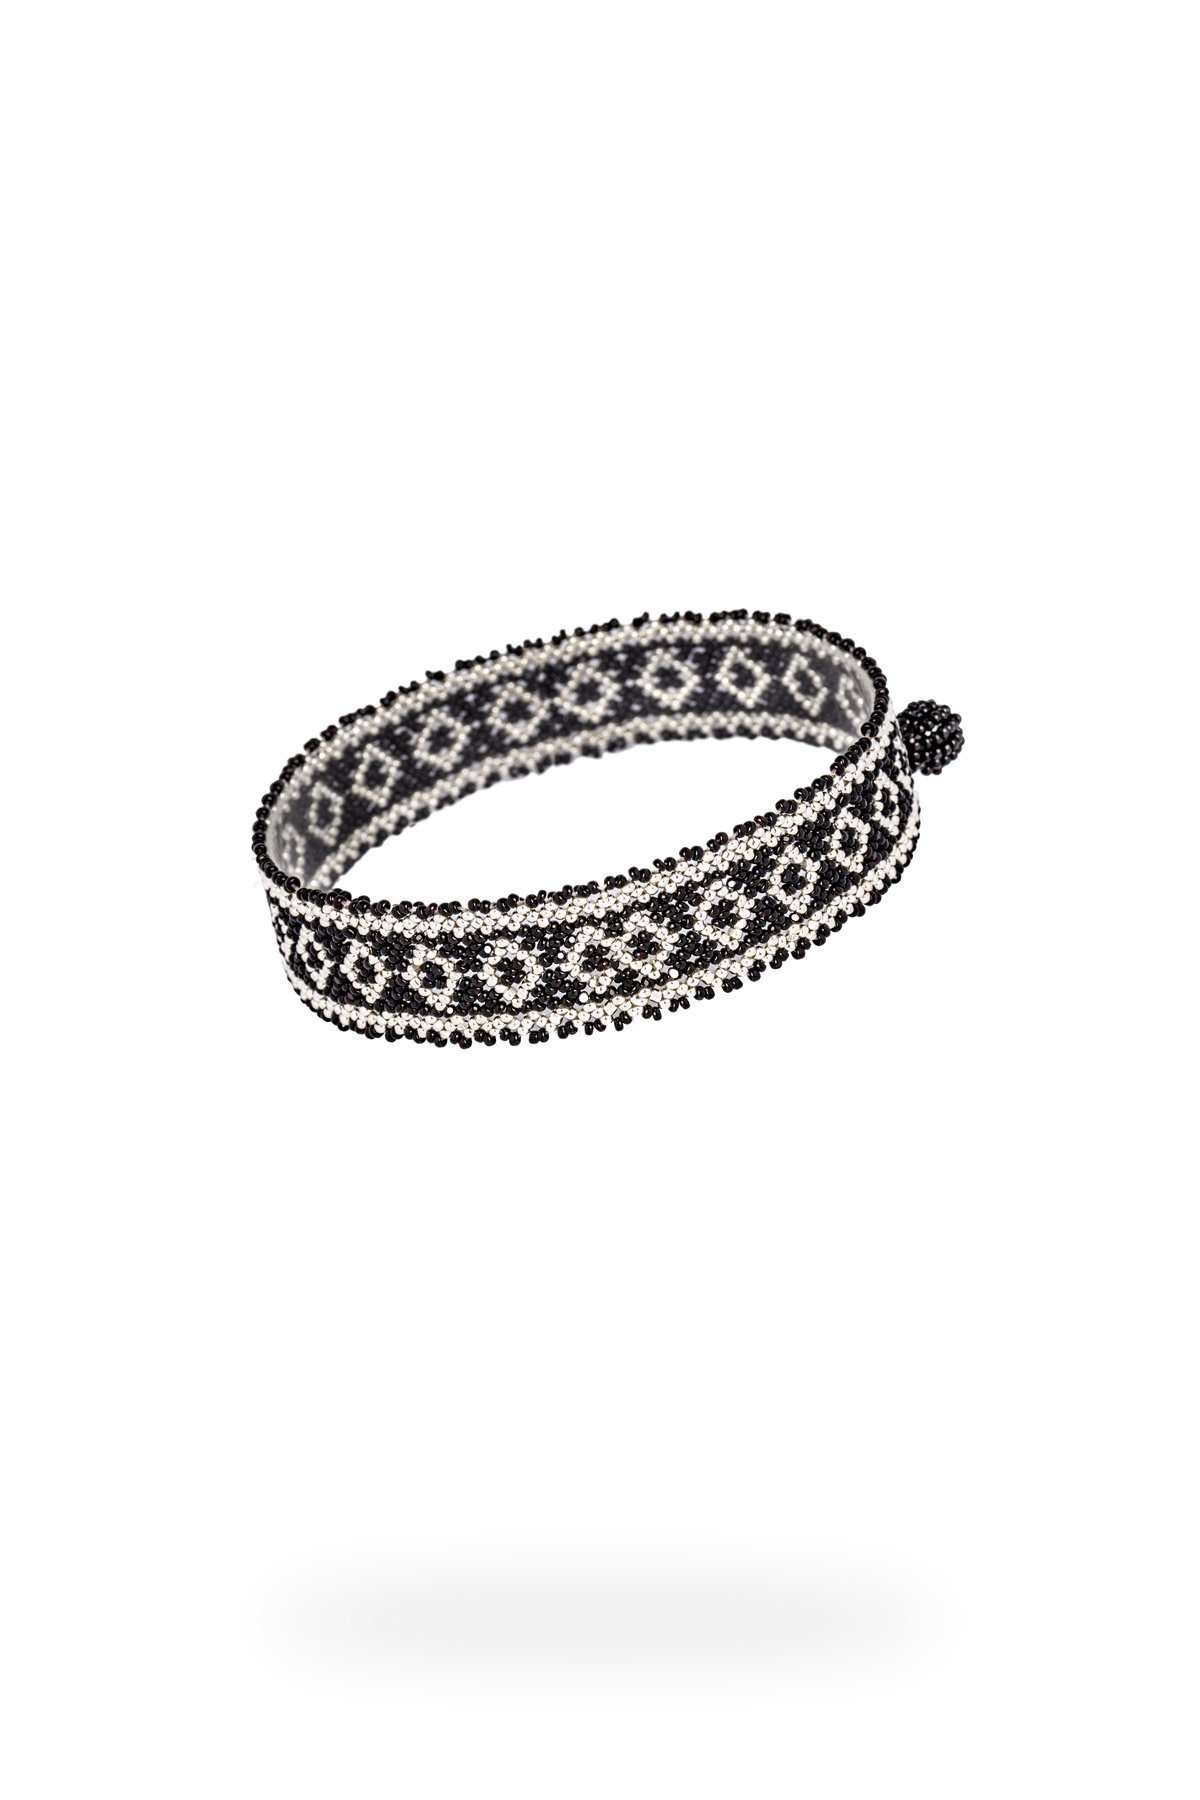 001 mini brazaletes plata negro